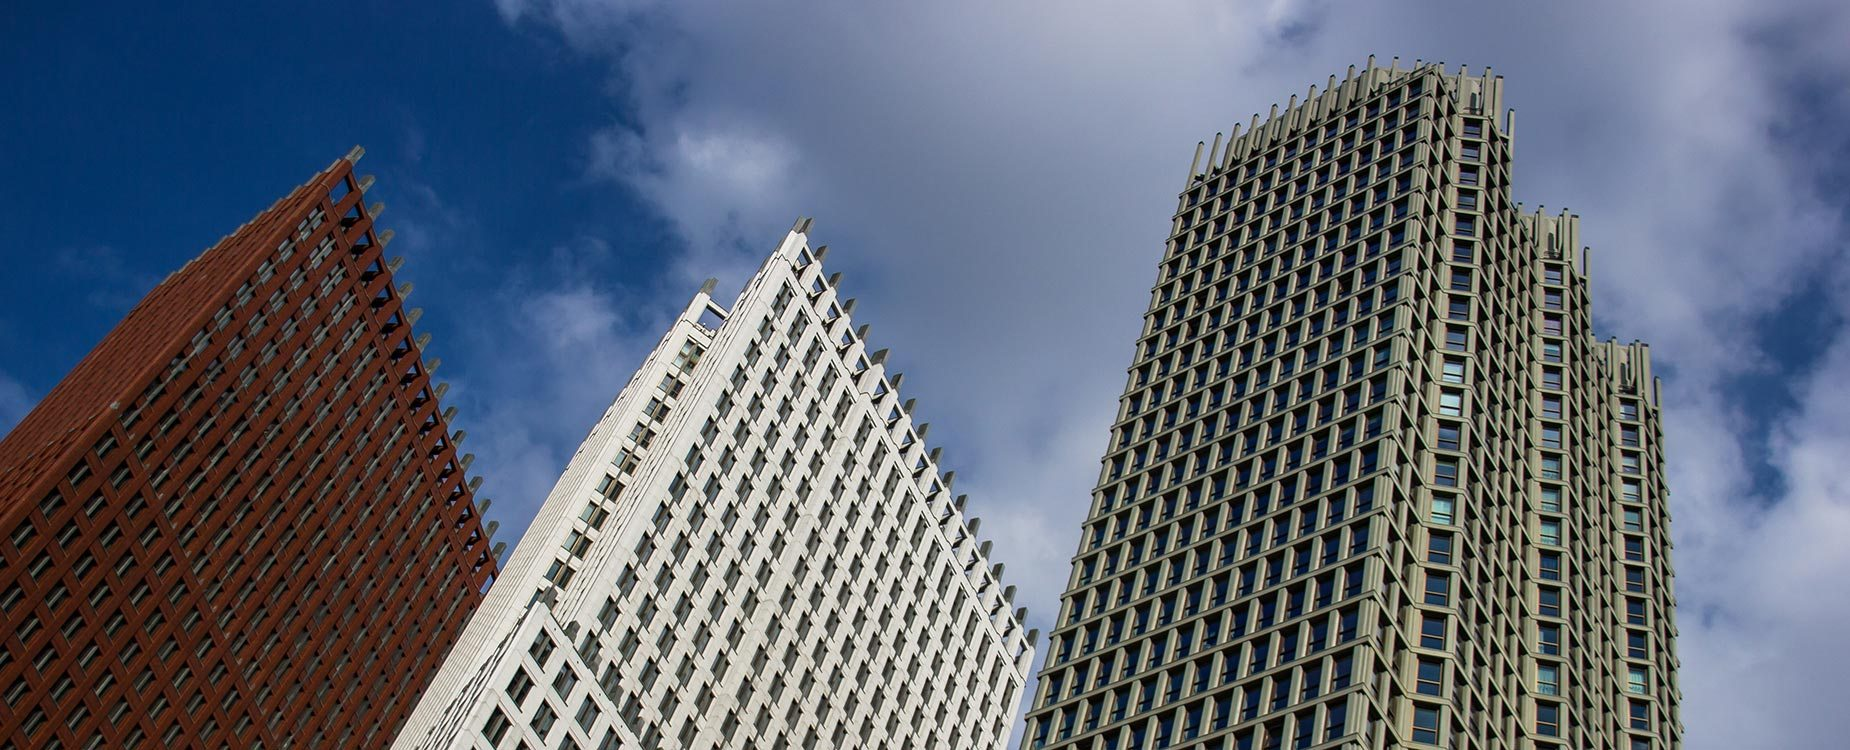 The Hague architecture